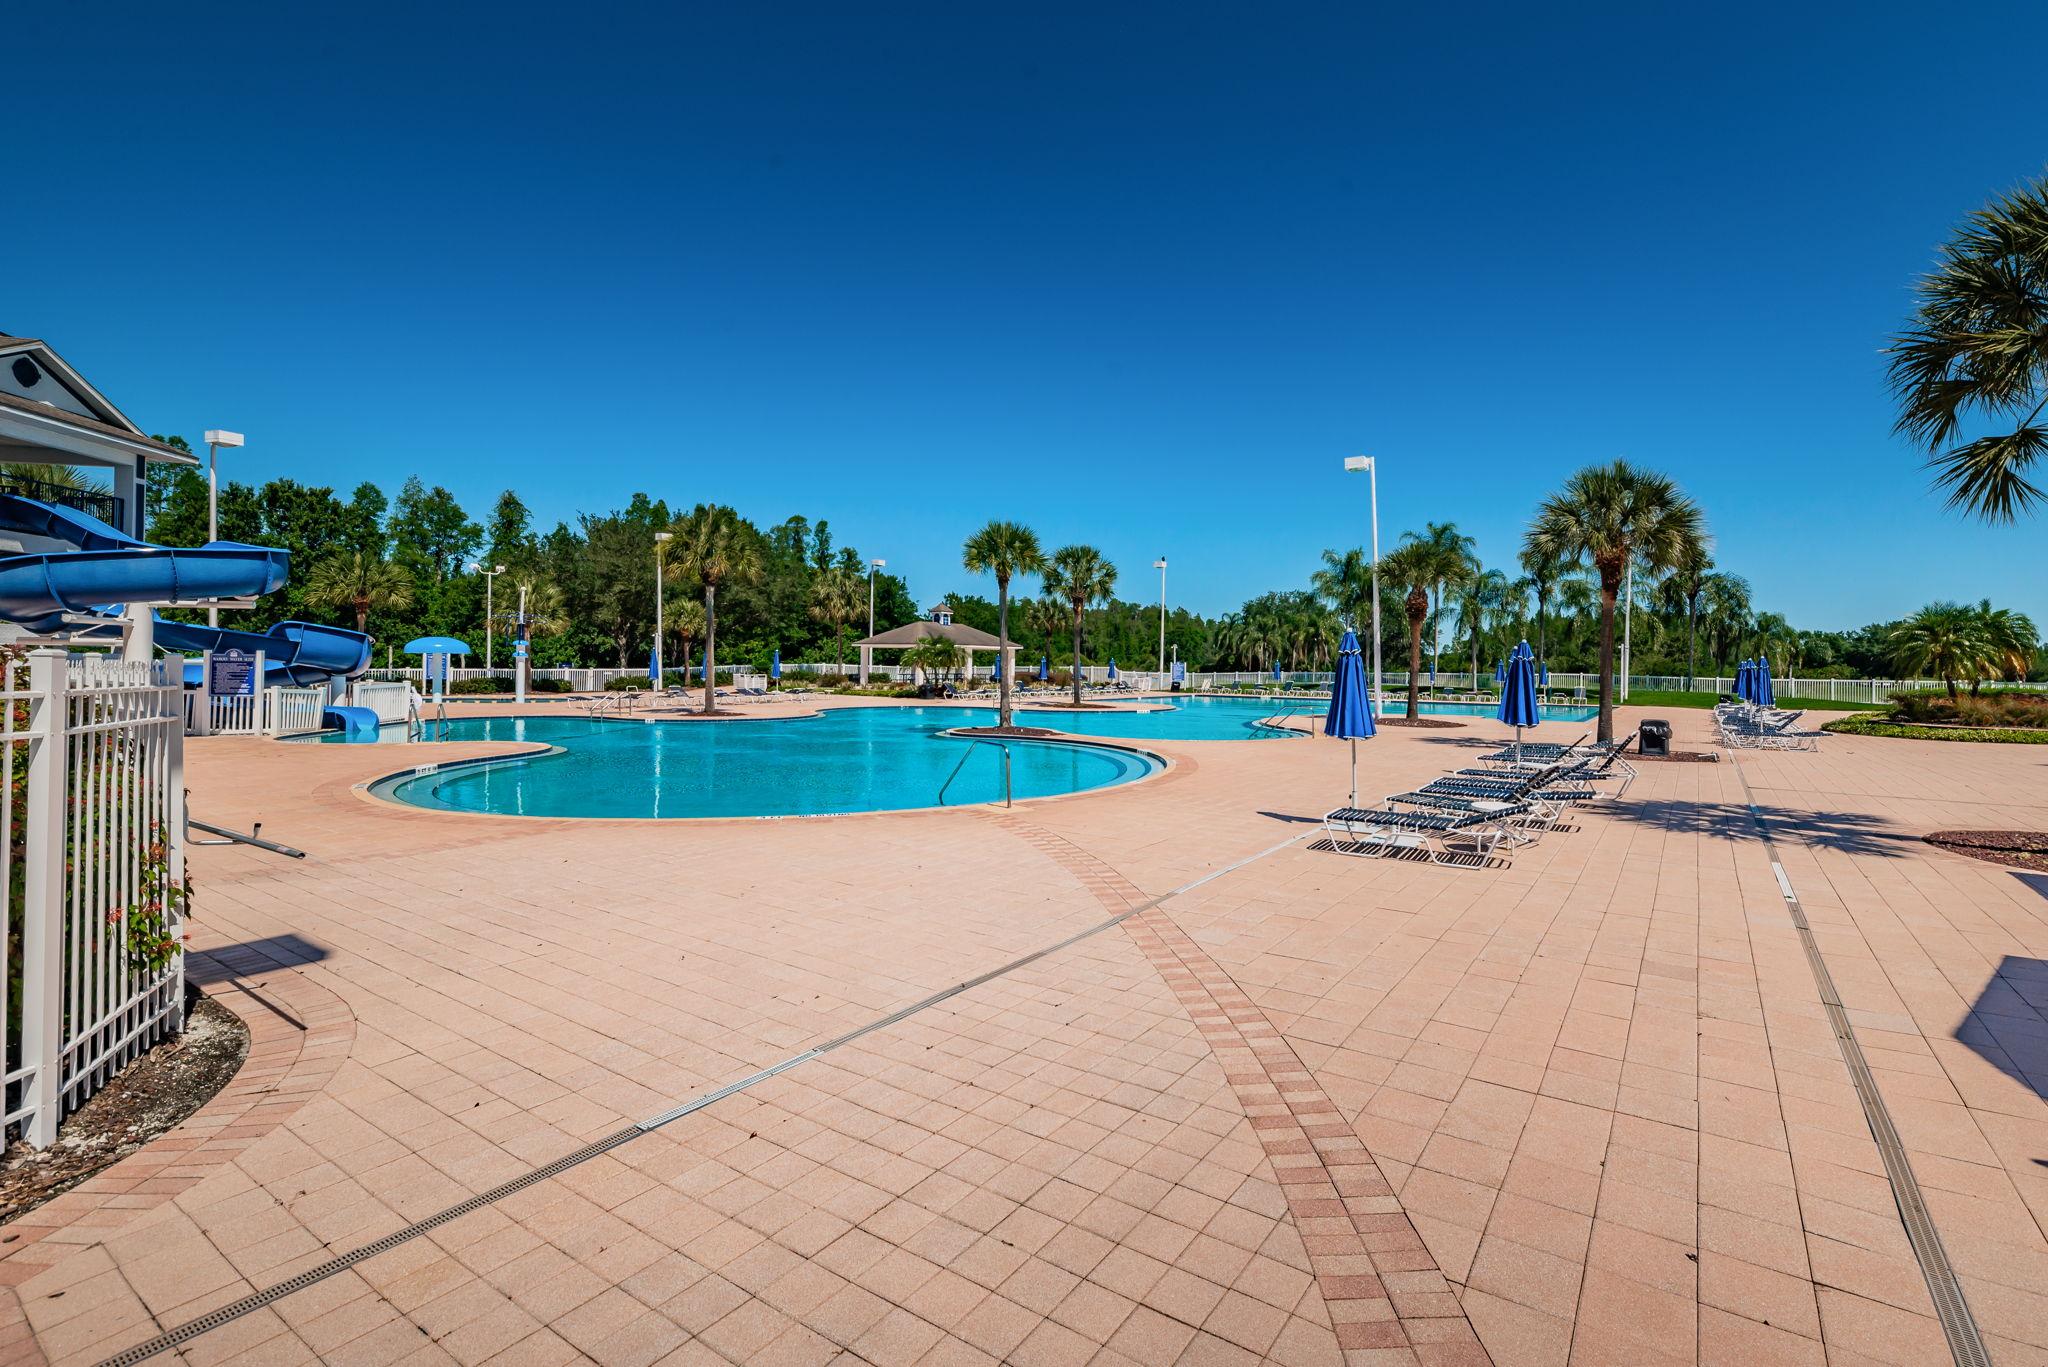 7-Community Pool